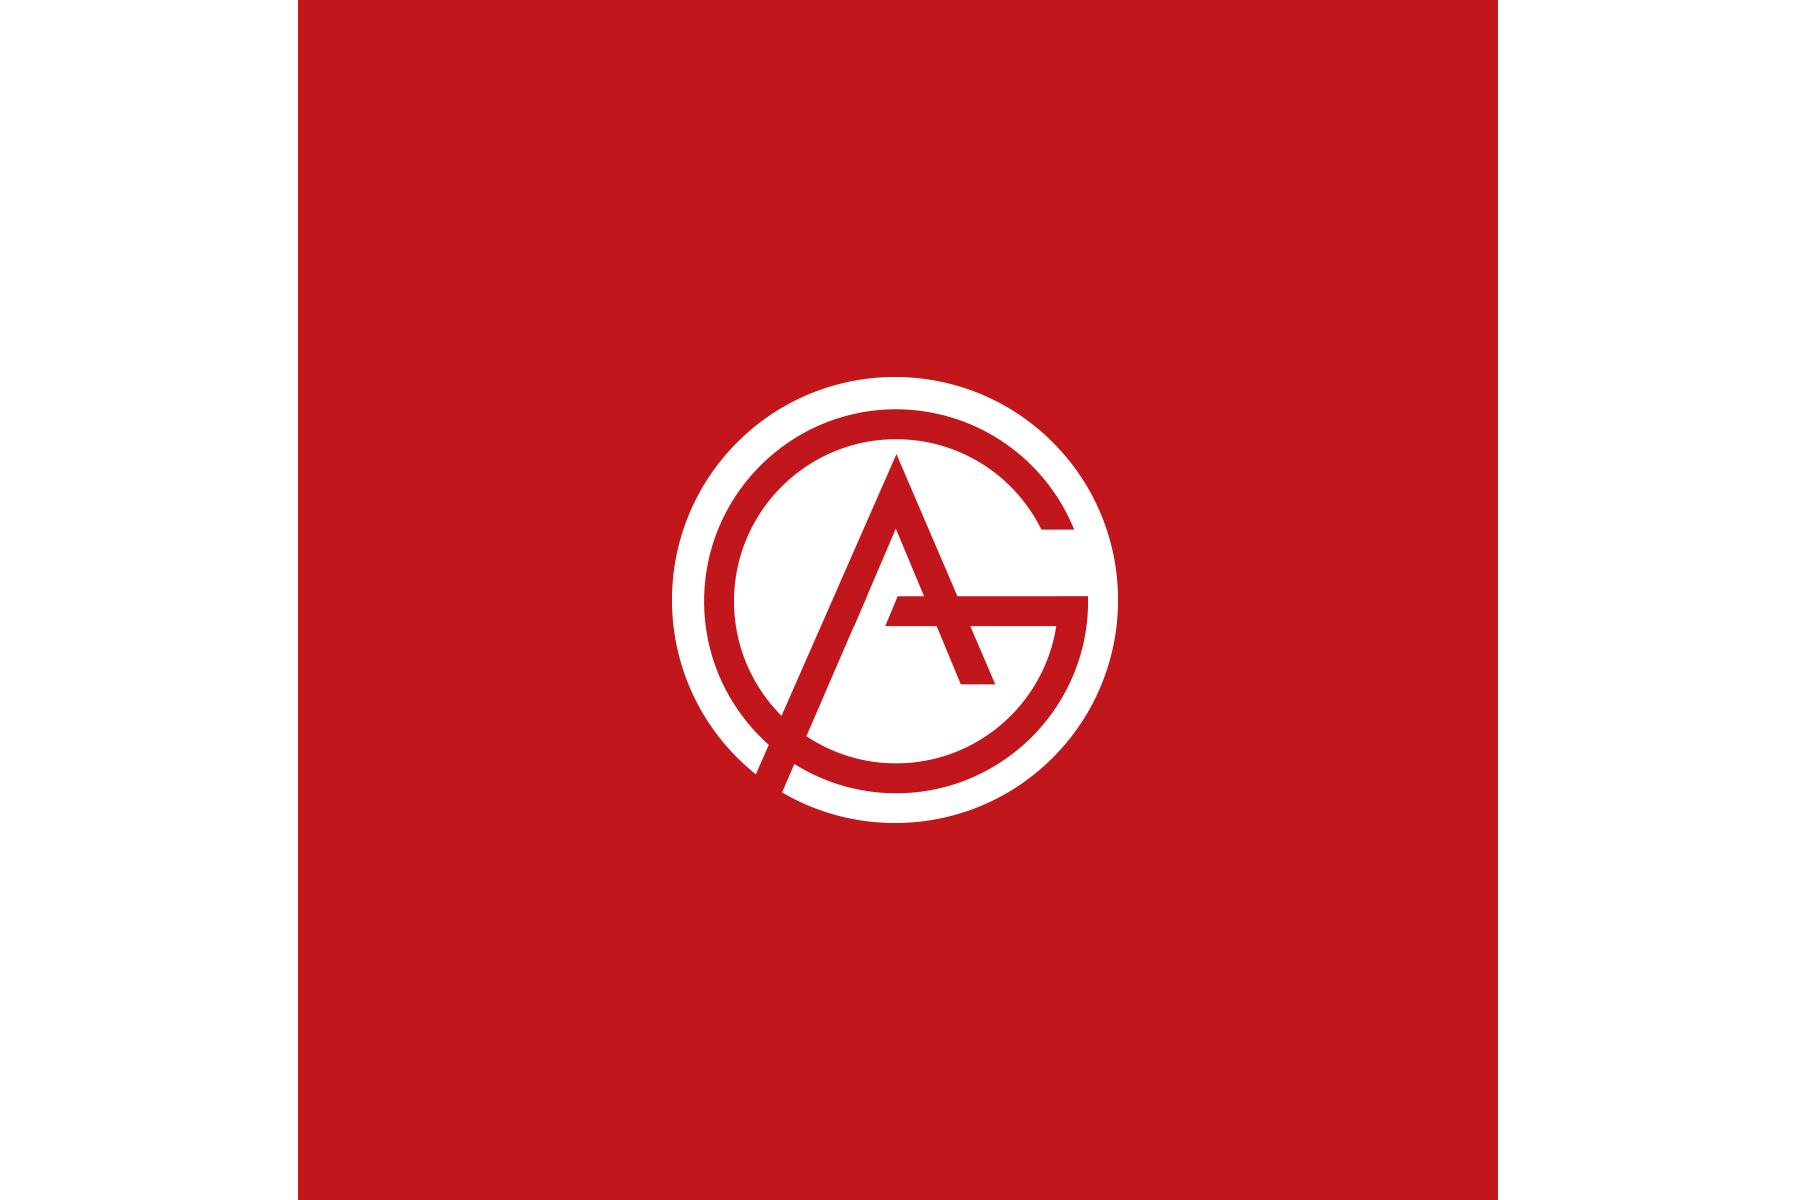 Logos_6x4_GA_ColorBlock.jpg